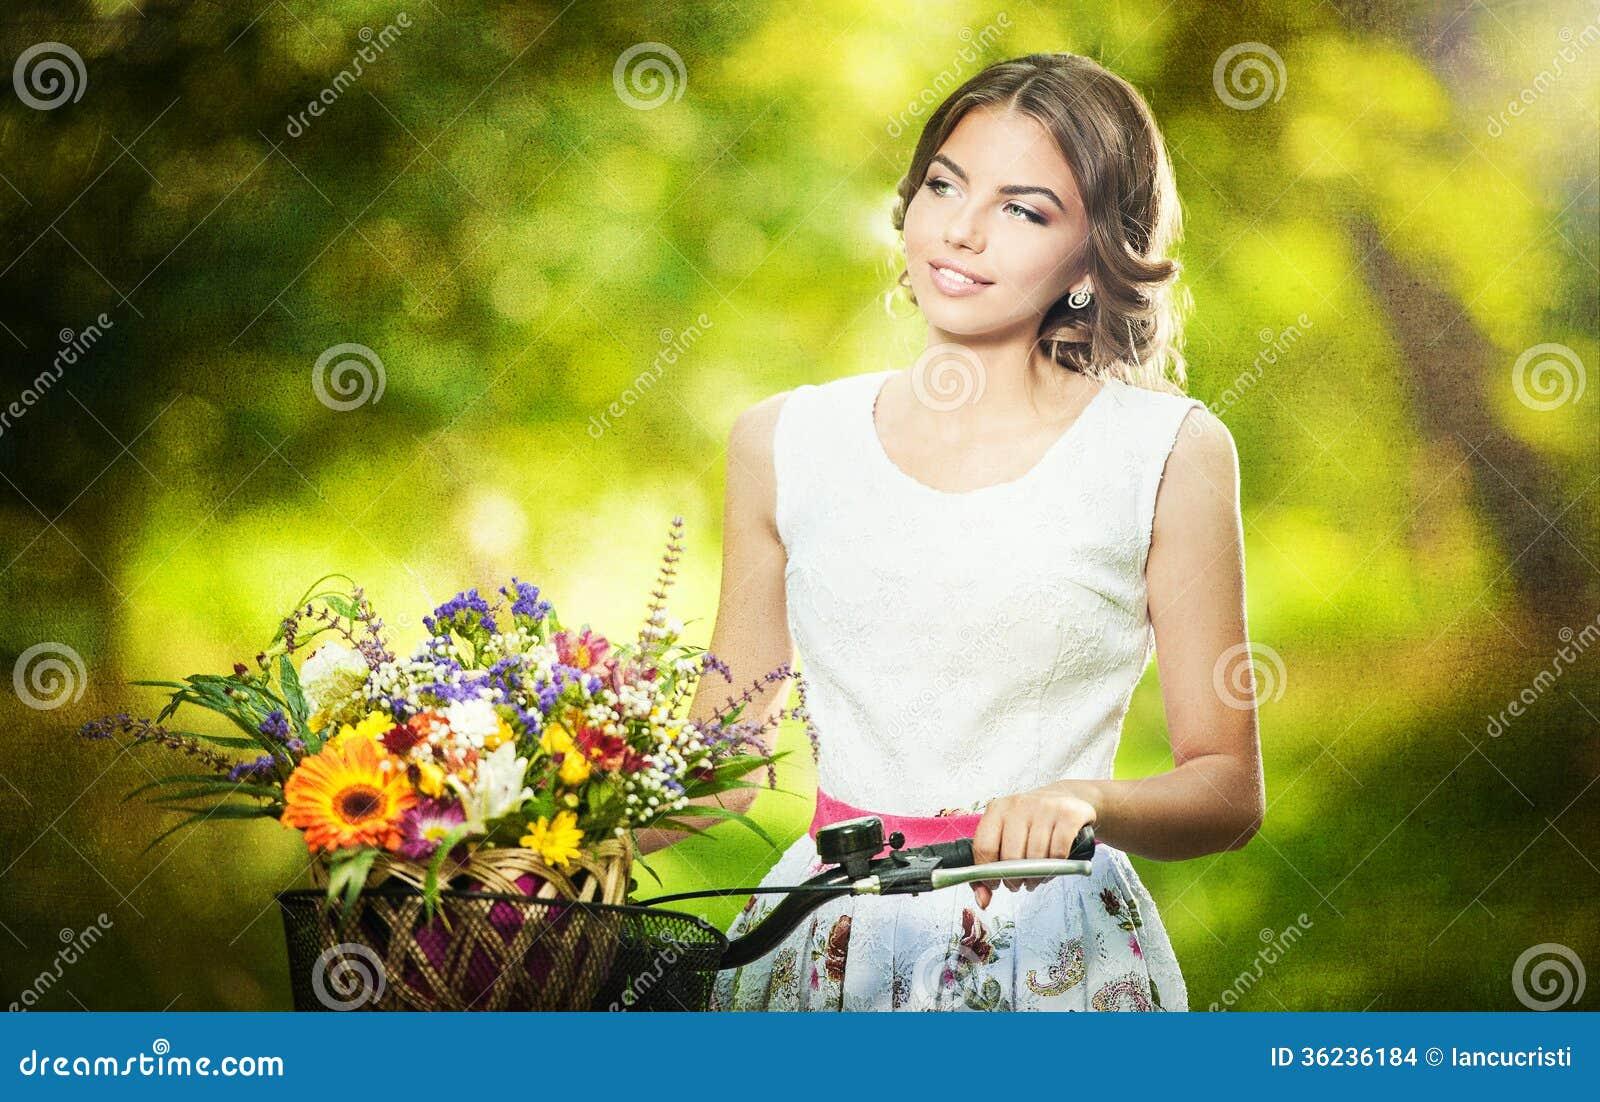 Beautiful Girl Wearing A Nice White Dress Having Fun In Park With